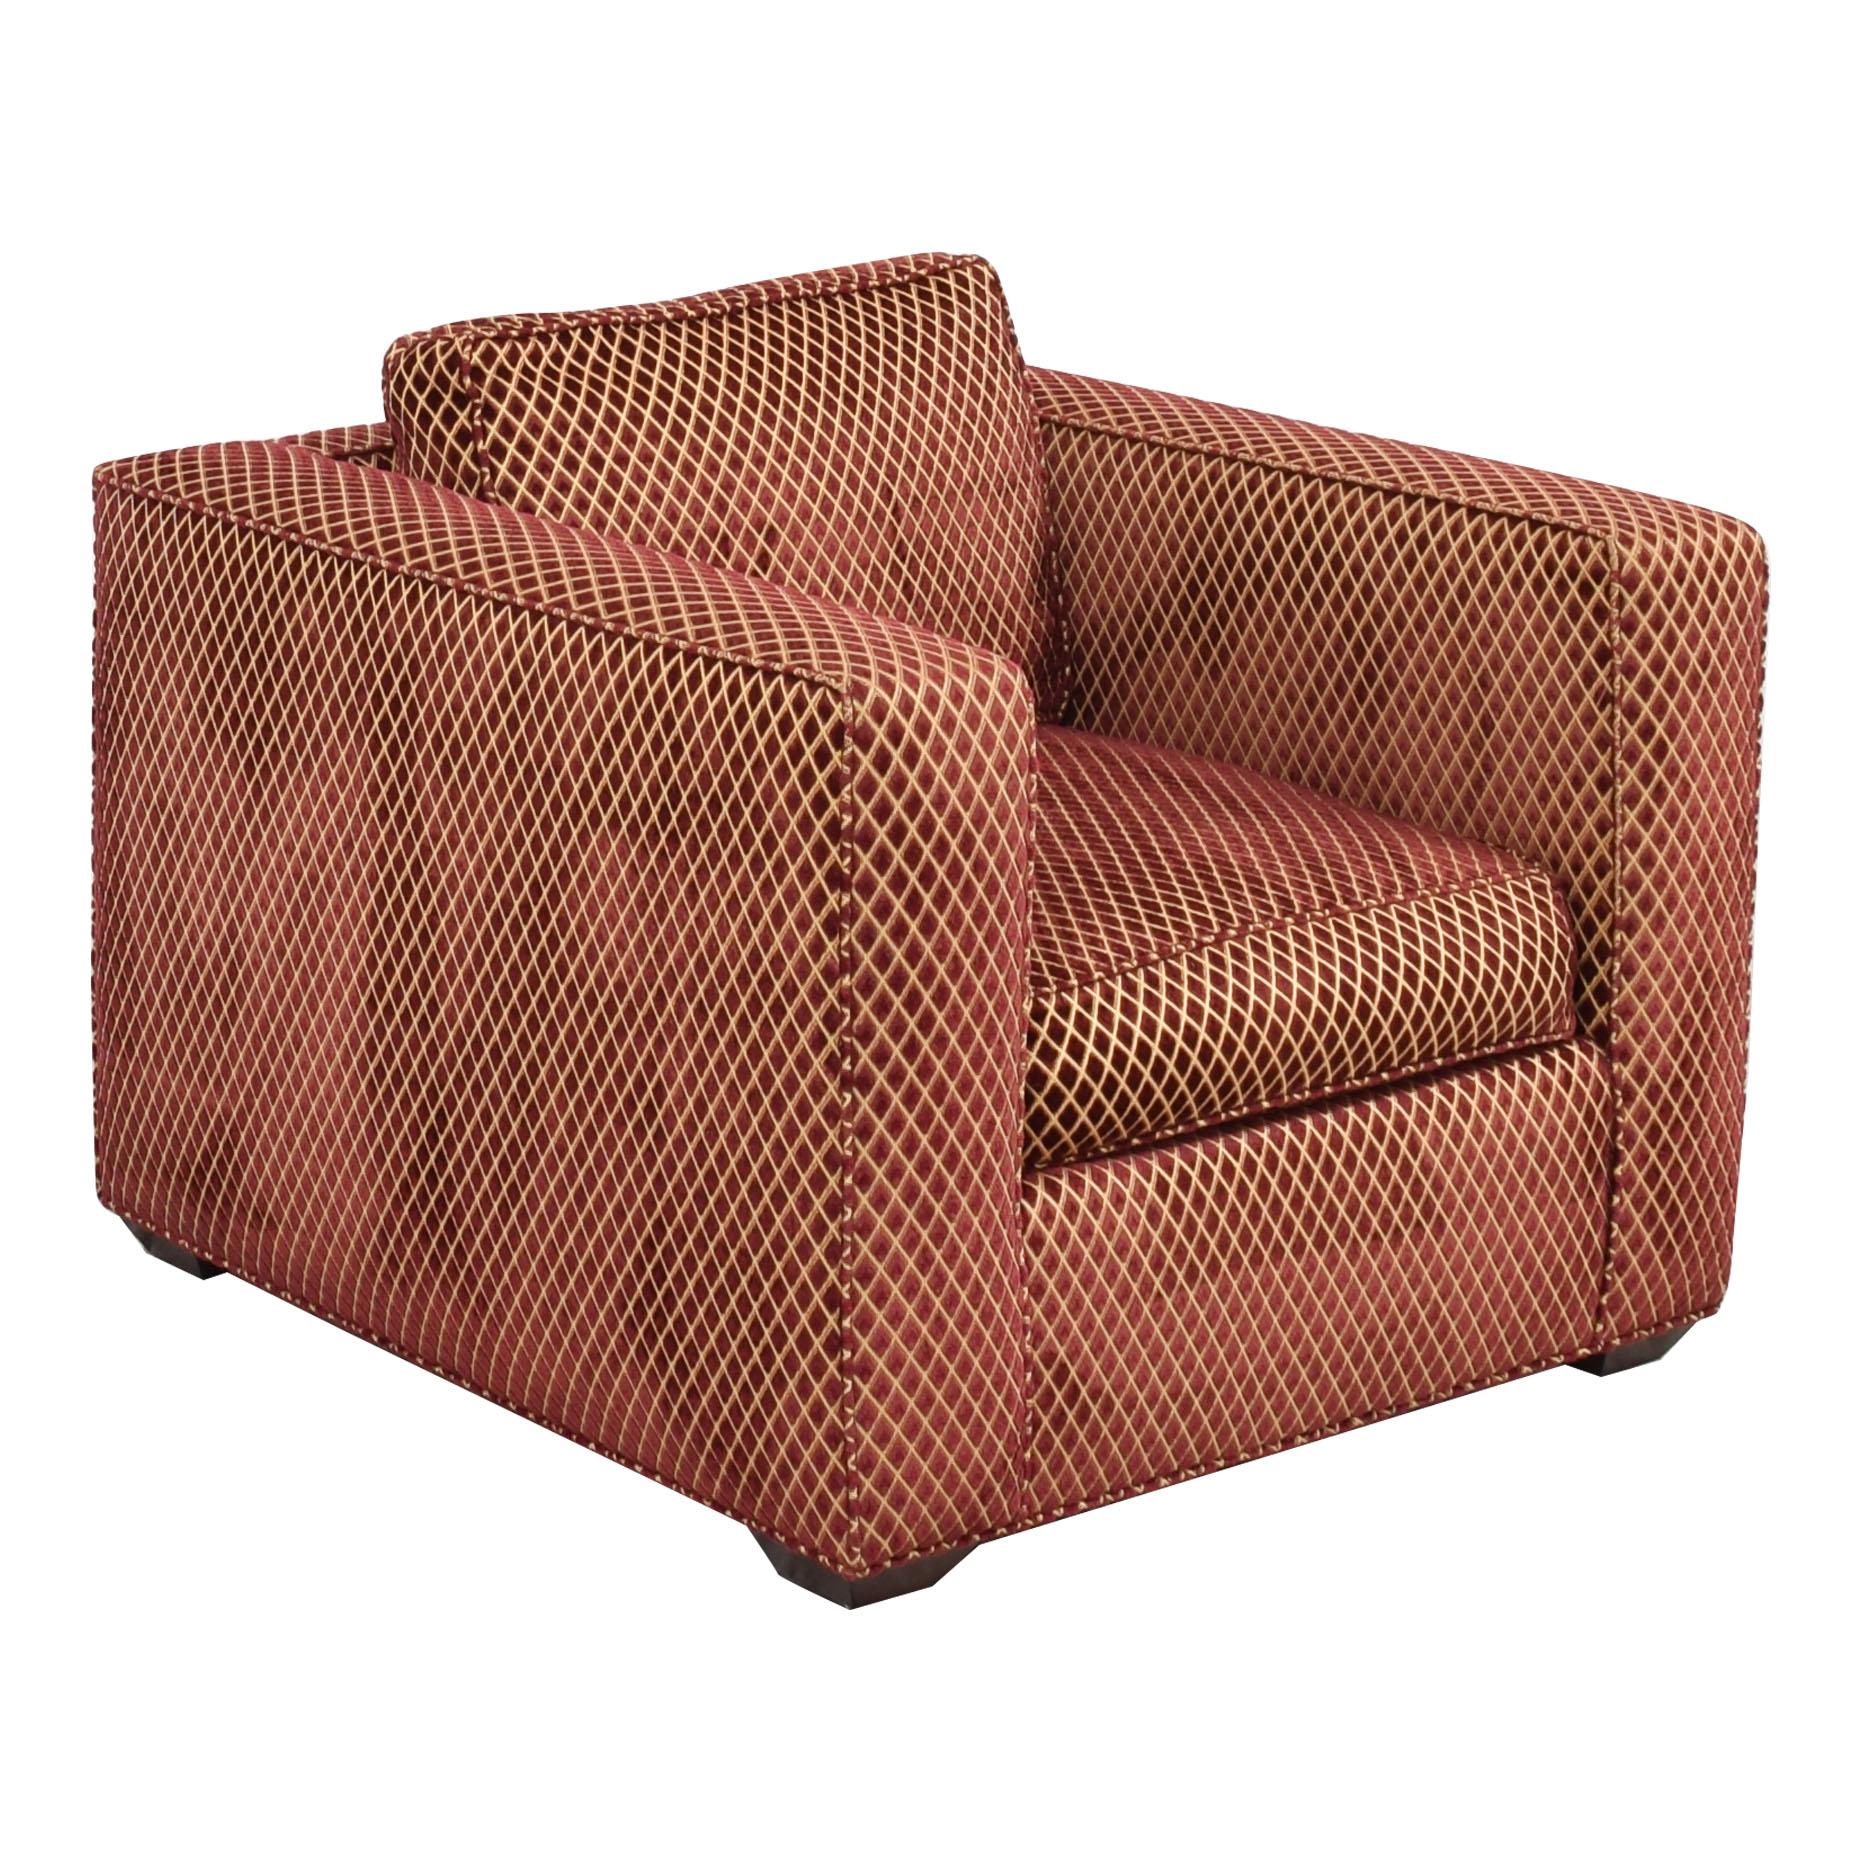 R.Jones R.Jones Club Lounge Chair on sale